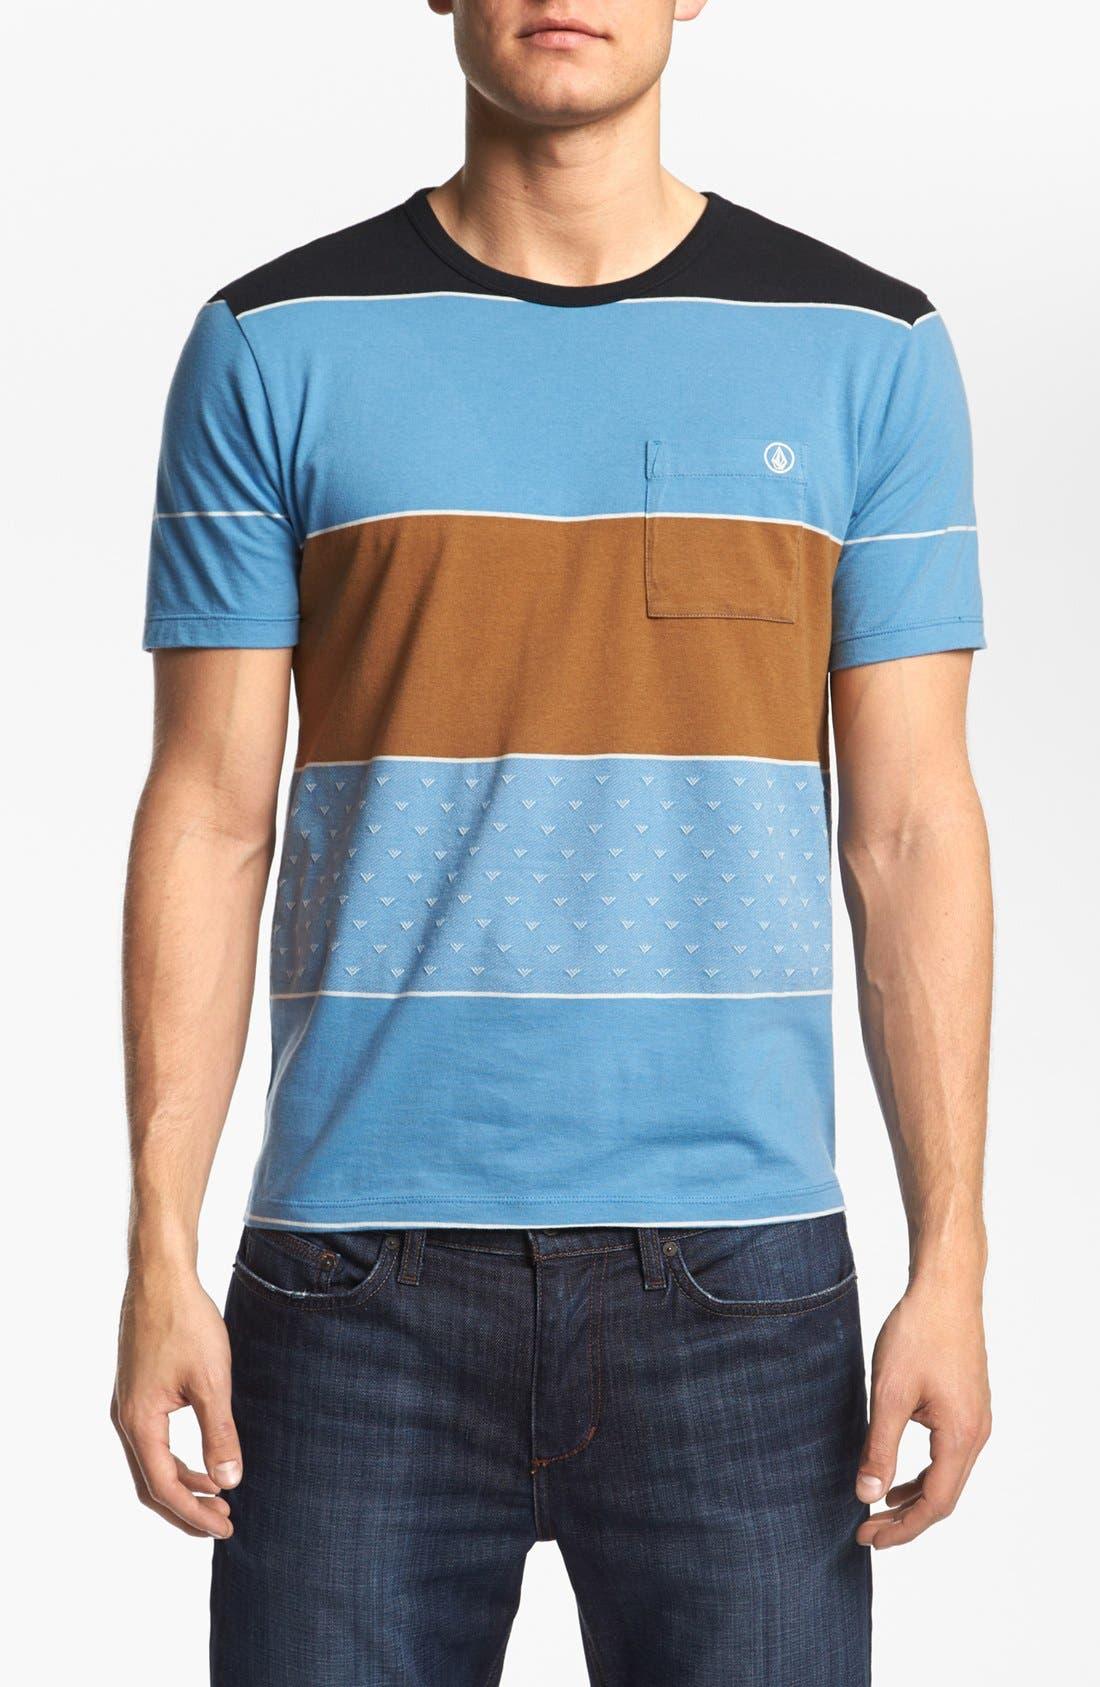 Main Image - Volcom 'Dornio' T-Shirt